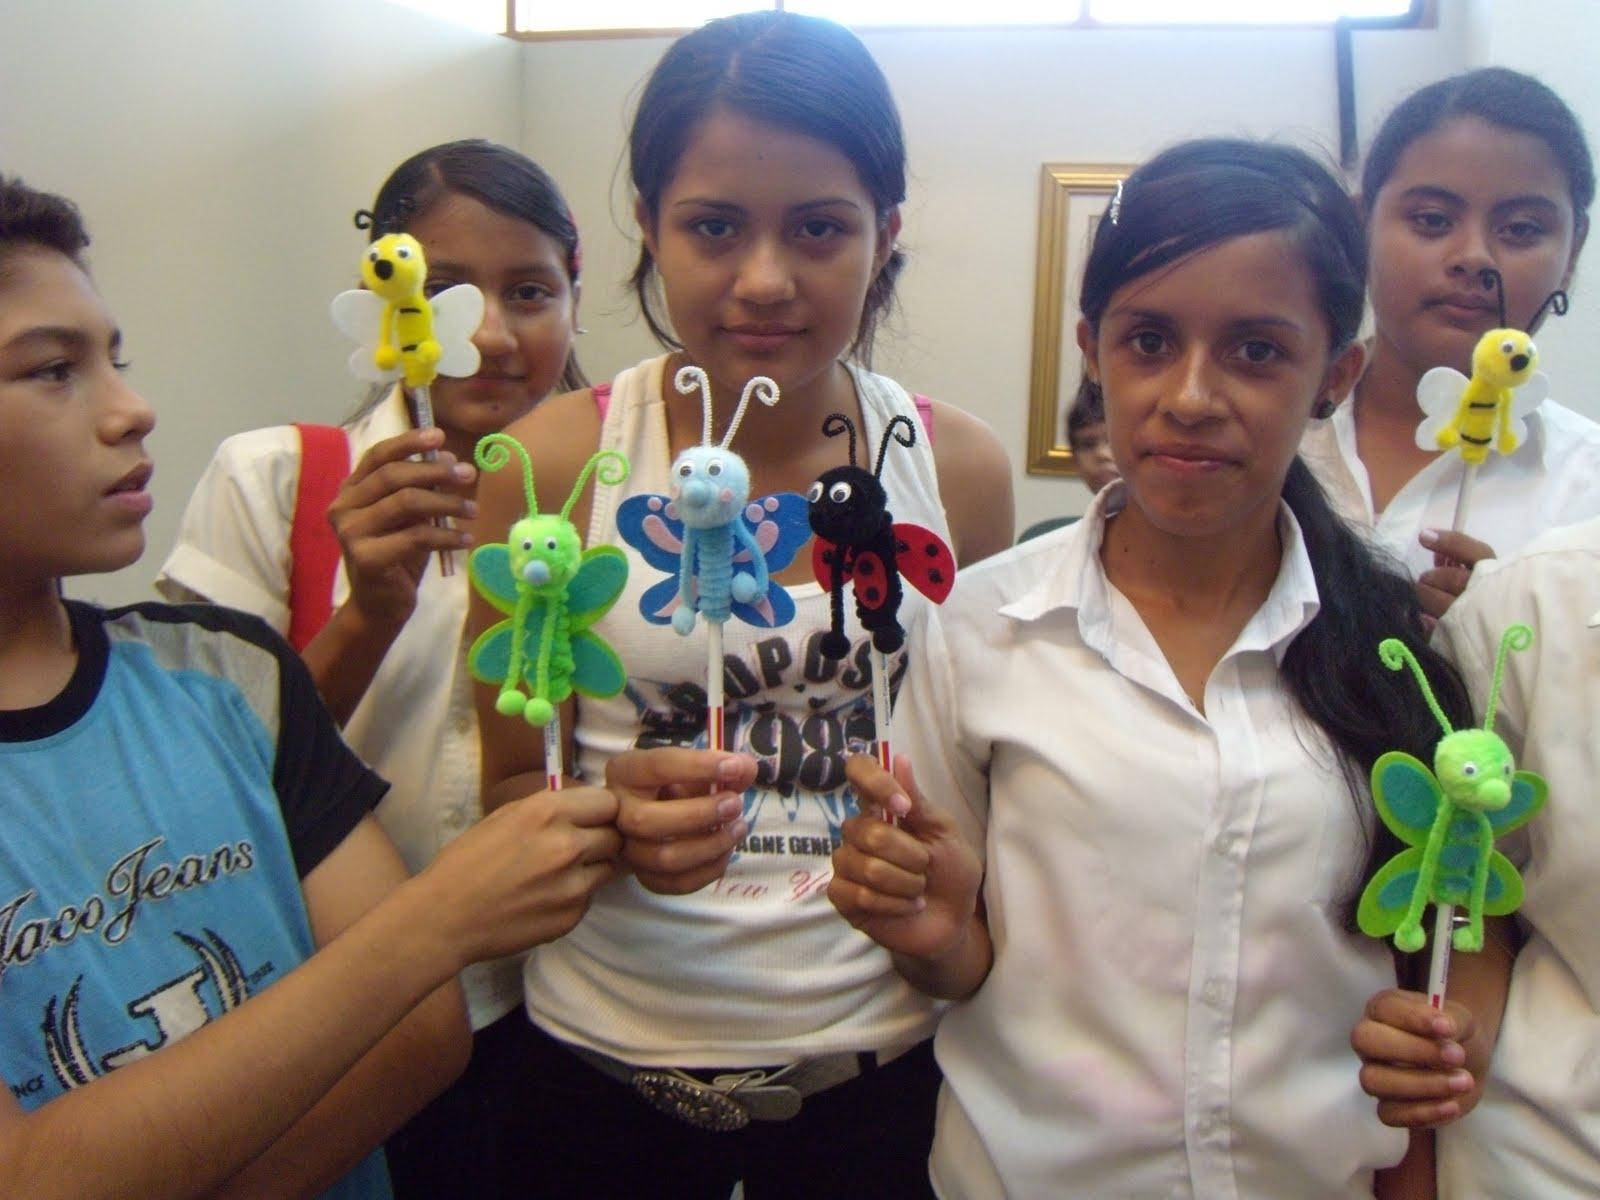 American Corner Nicaragua Voluntario De La Embajada Americana